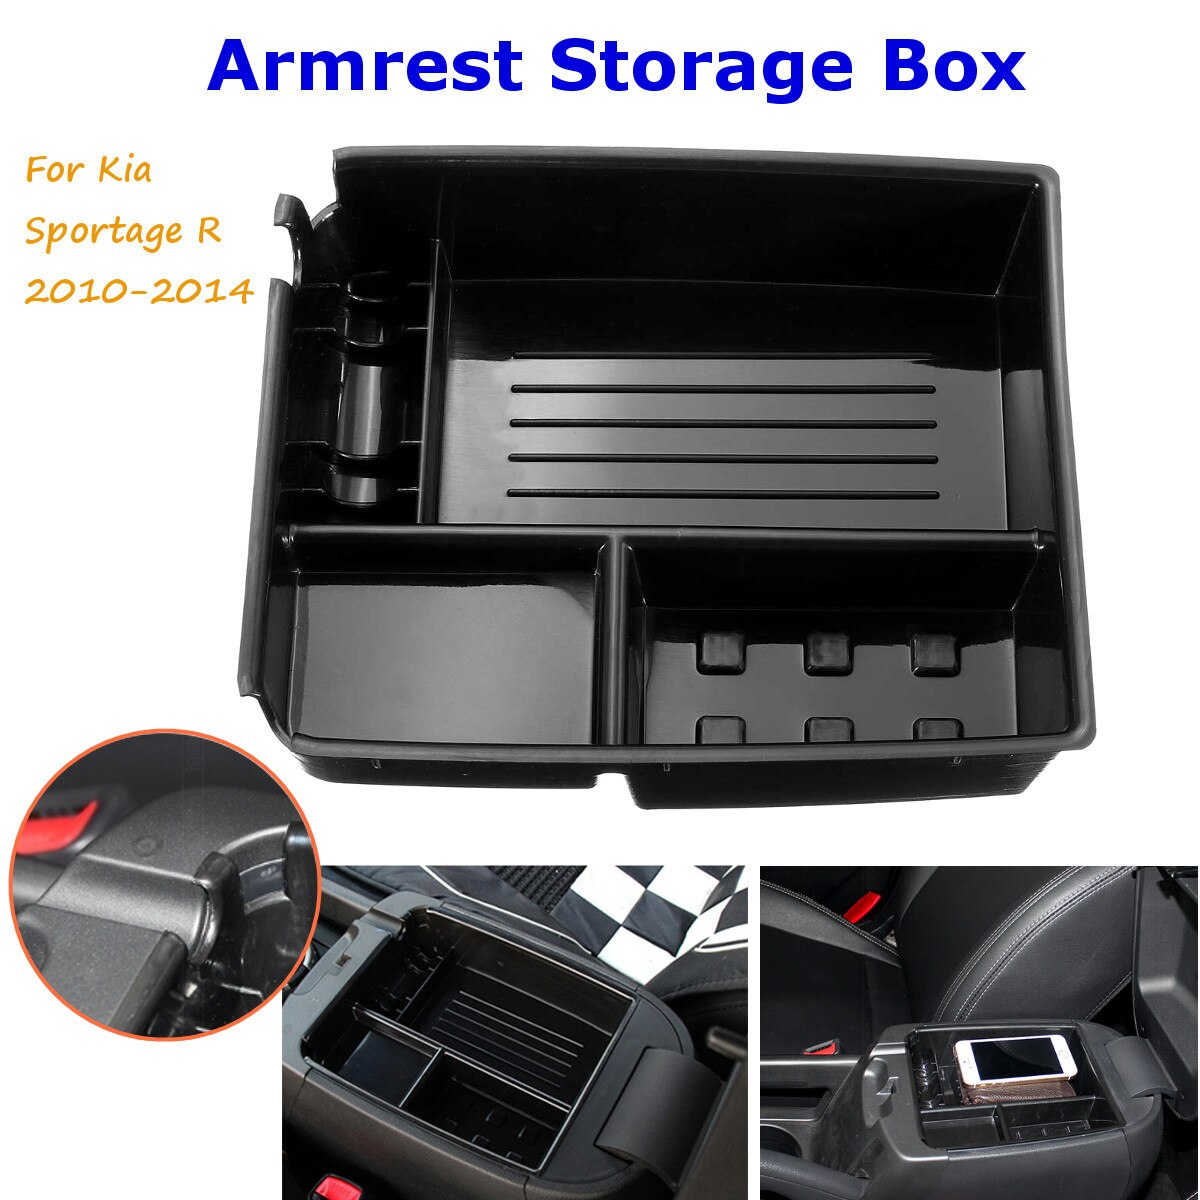 ABS Central Storage Pallet Armrest Container Decorative Box Case For Kia Sportage R 2010 2011 2012 2013 2014